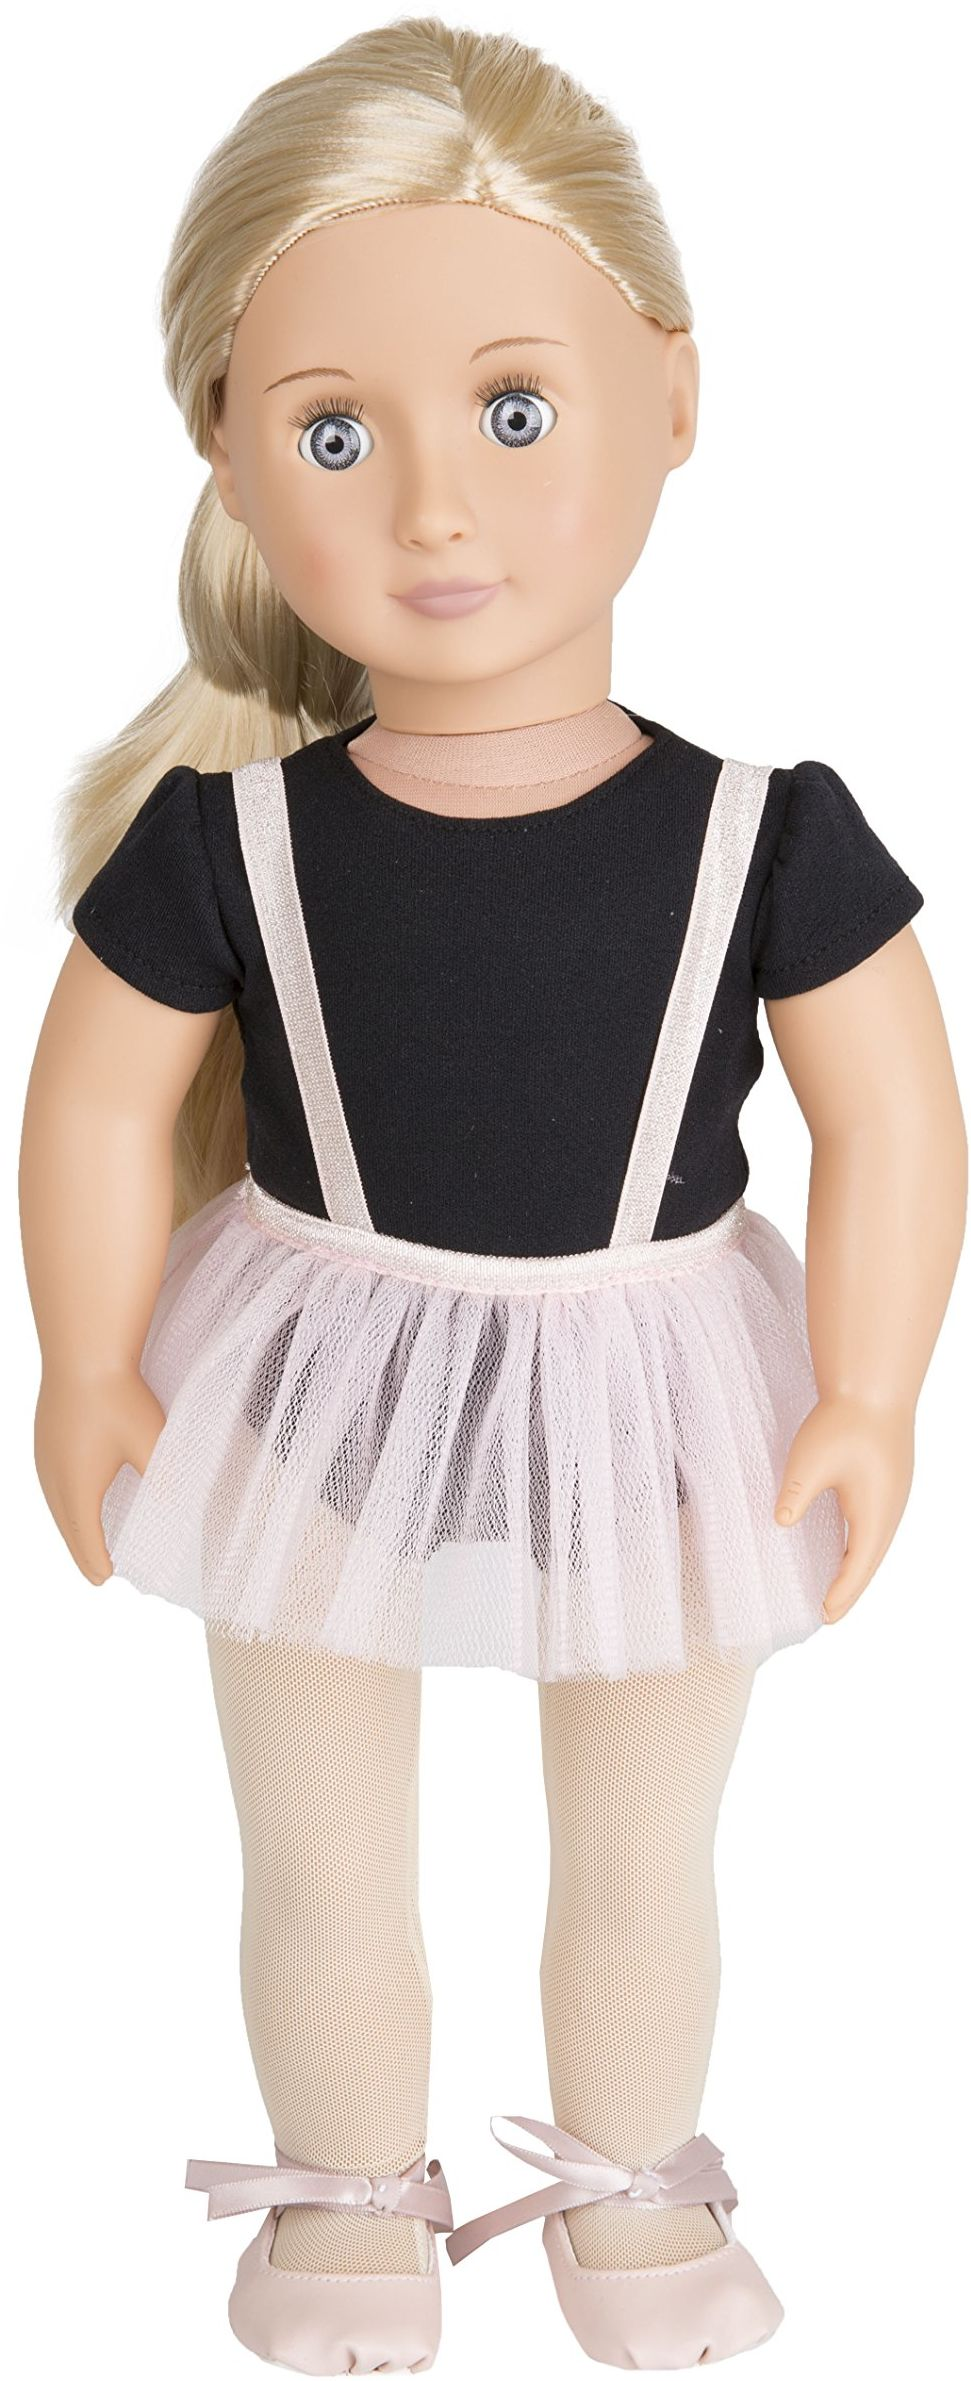 Our Generation 70.31076Z fioletowa zabawka Anna regularna, różna, 18 cali / 46 cm lalka